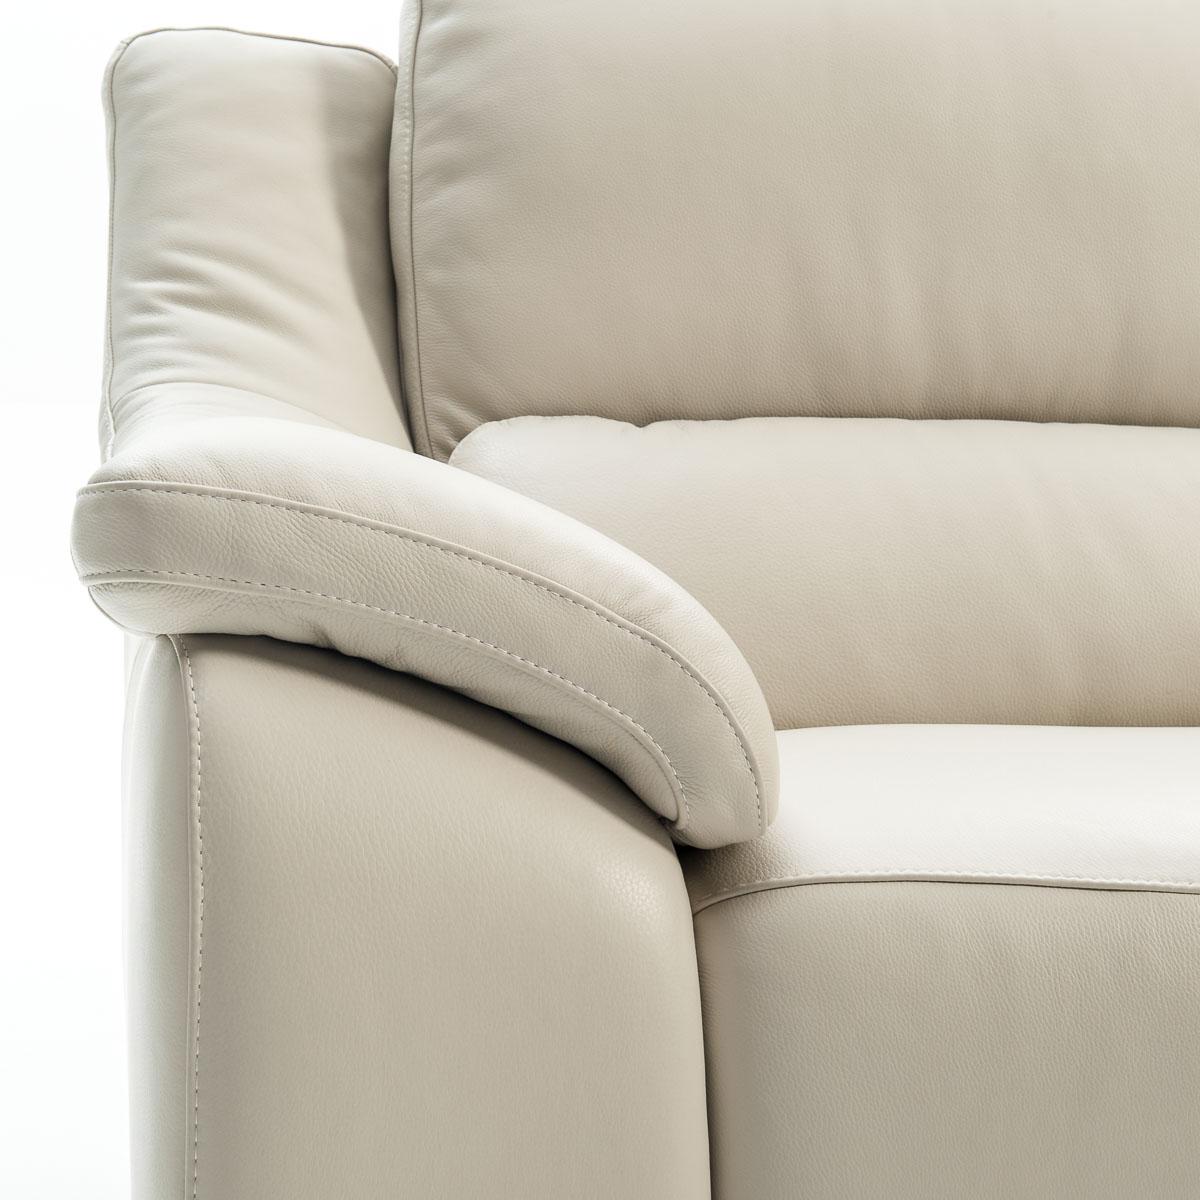 Livorno 3 Seater Sofa